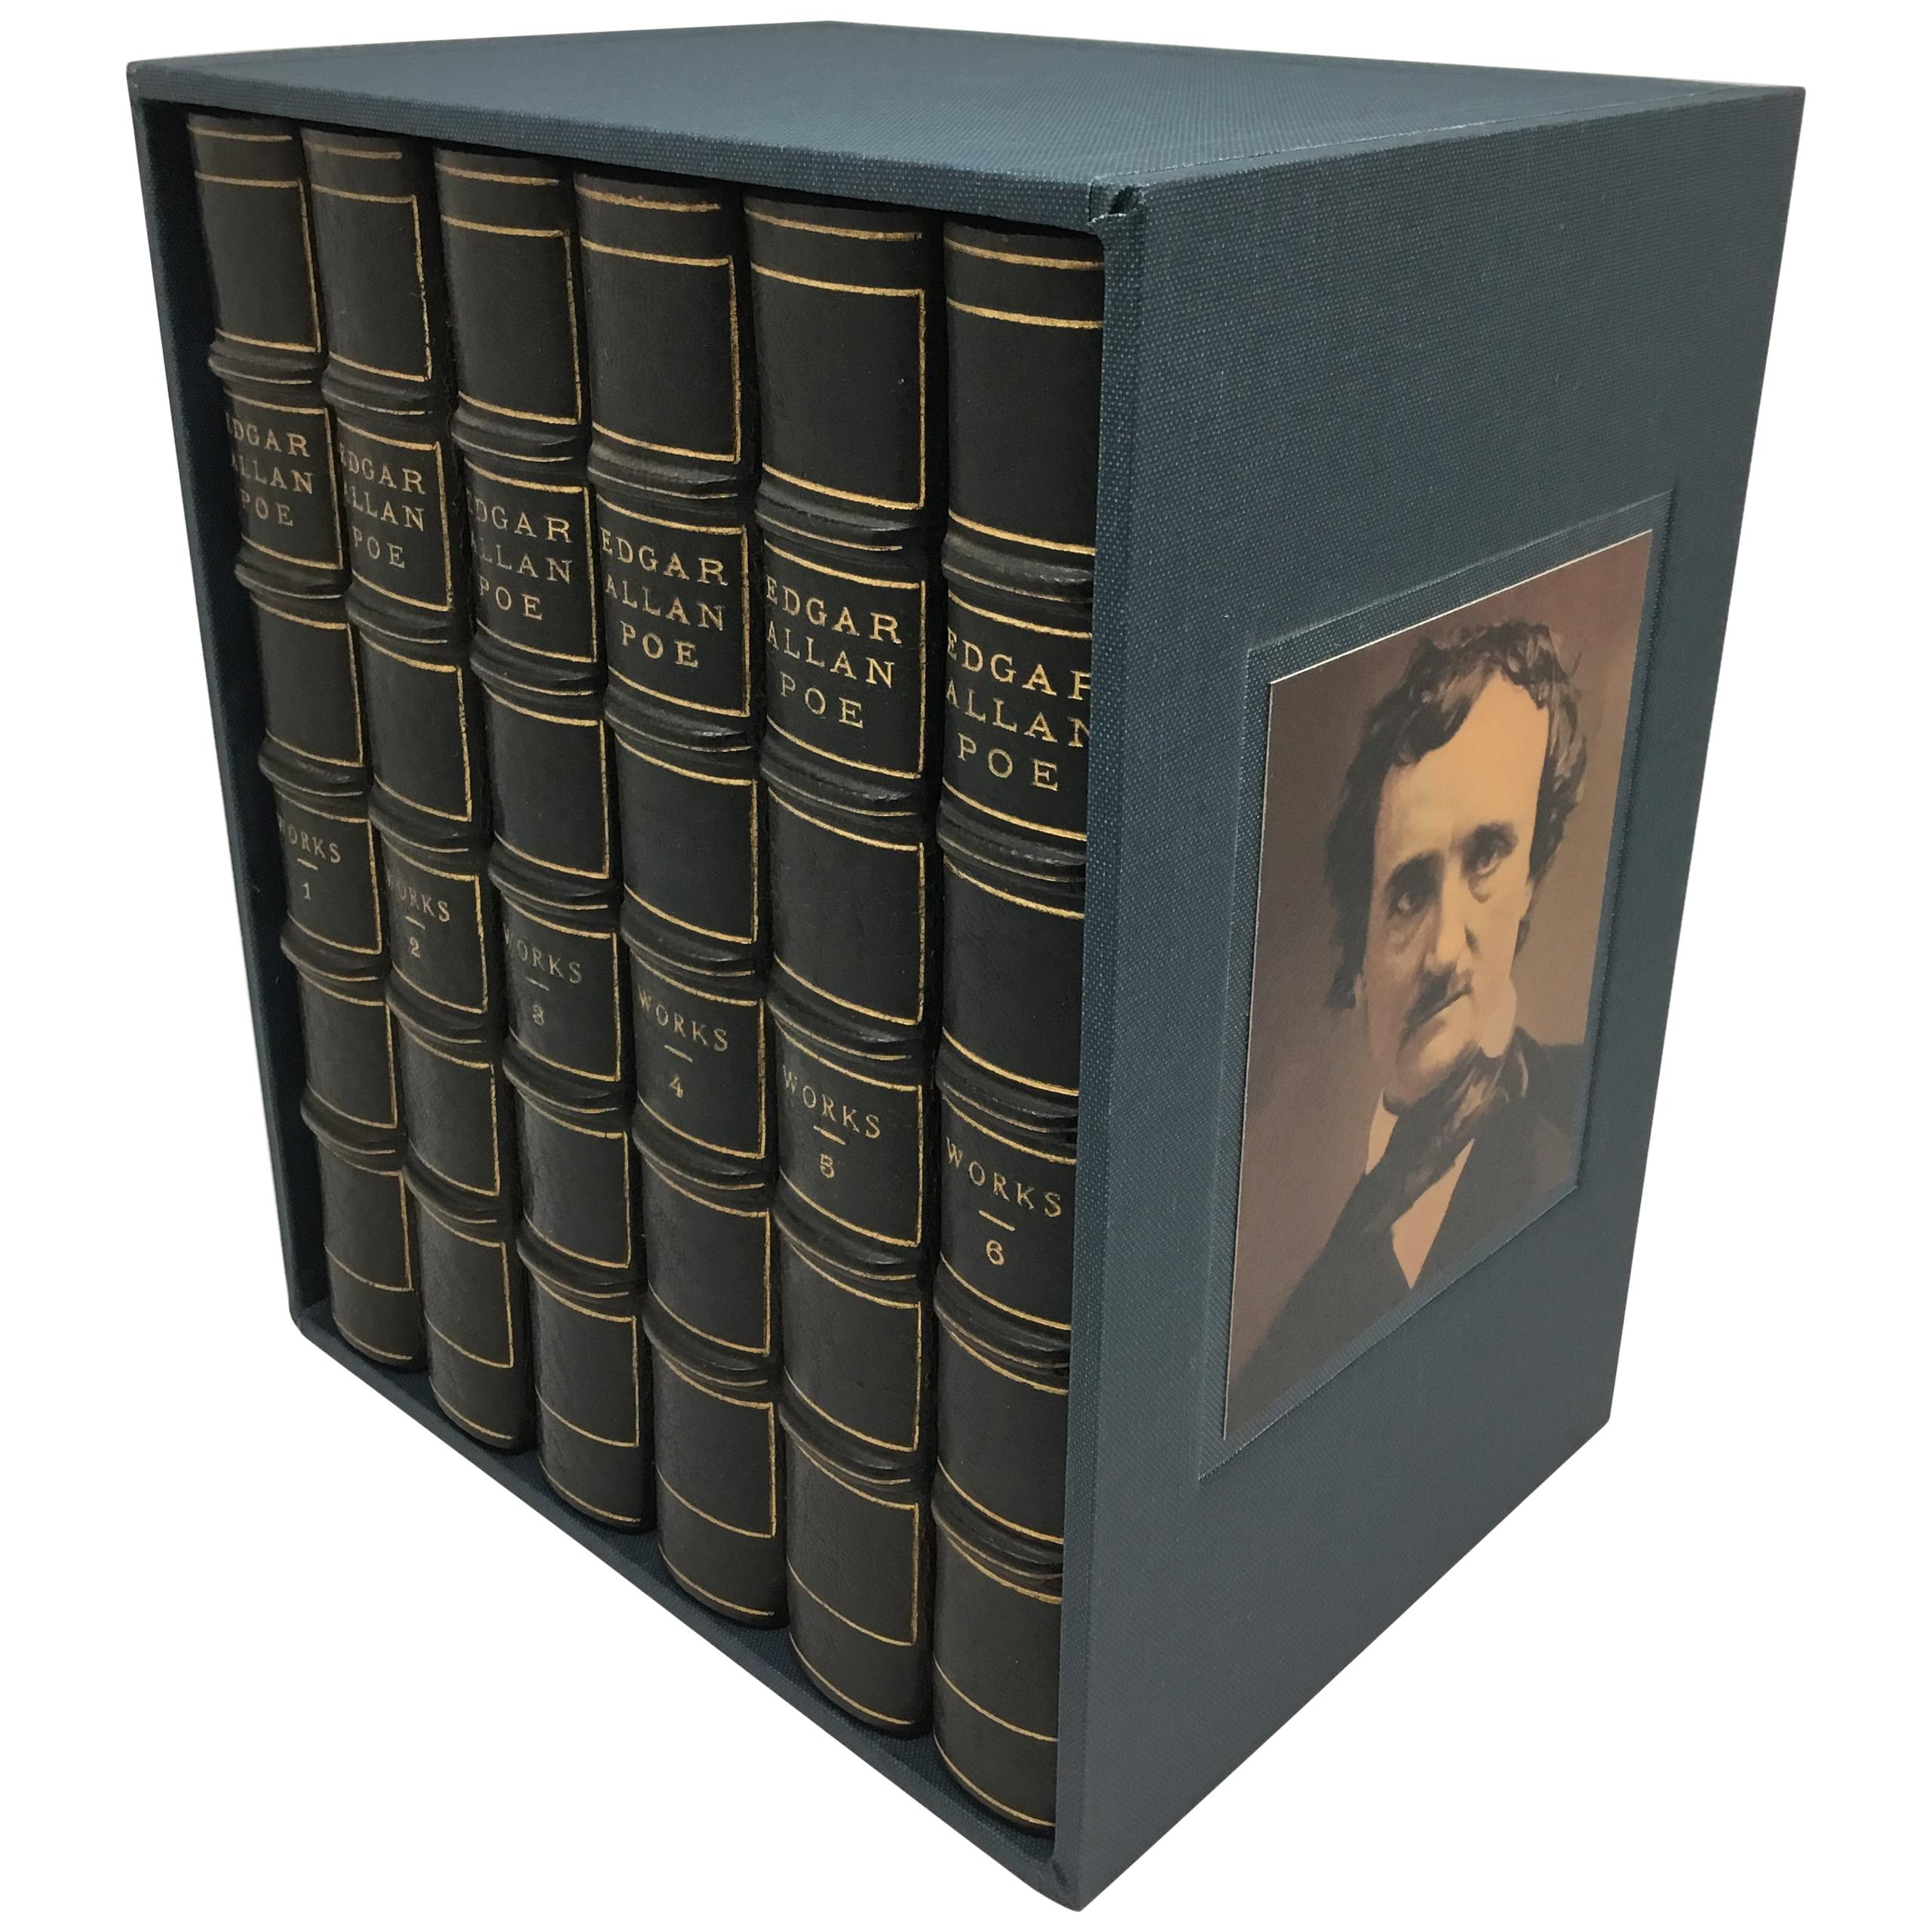 Edgar Allan Poe, 6 Volume Putnam Edition in Period Leather Bindings, 1902